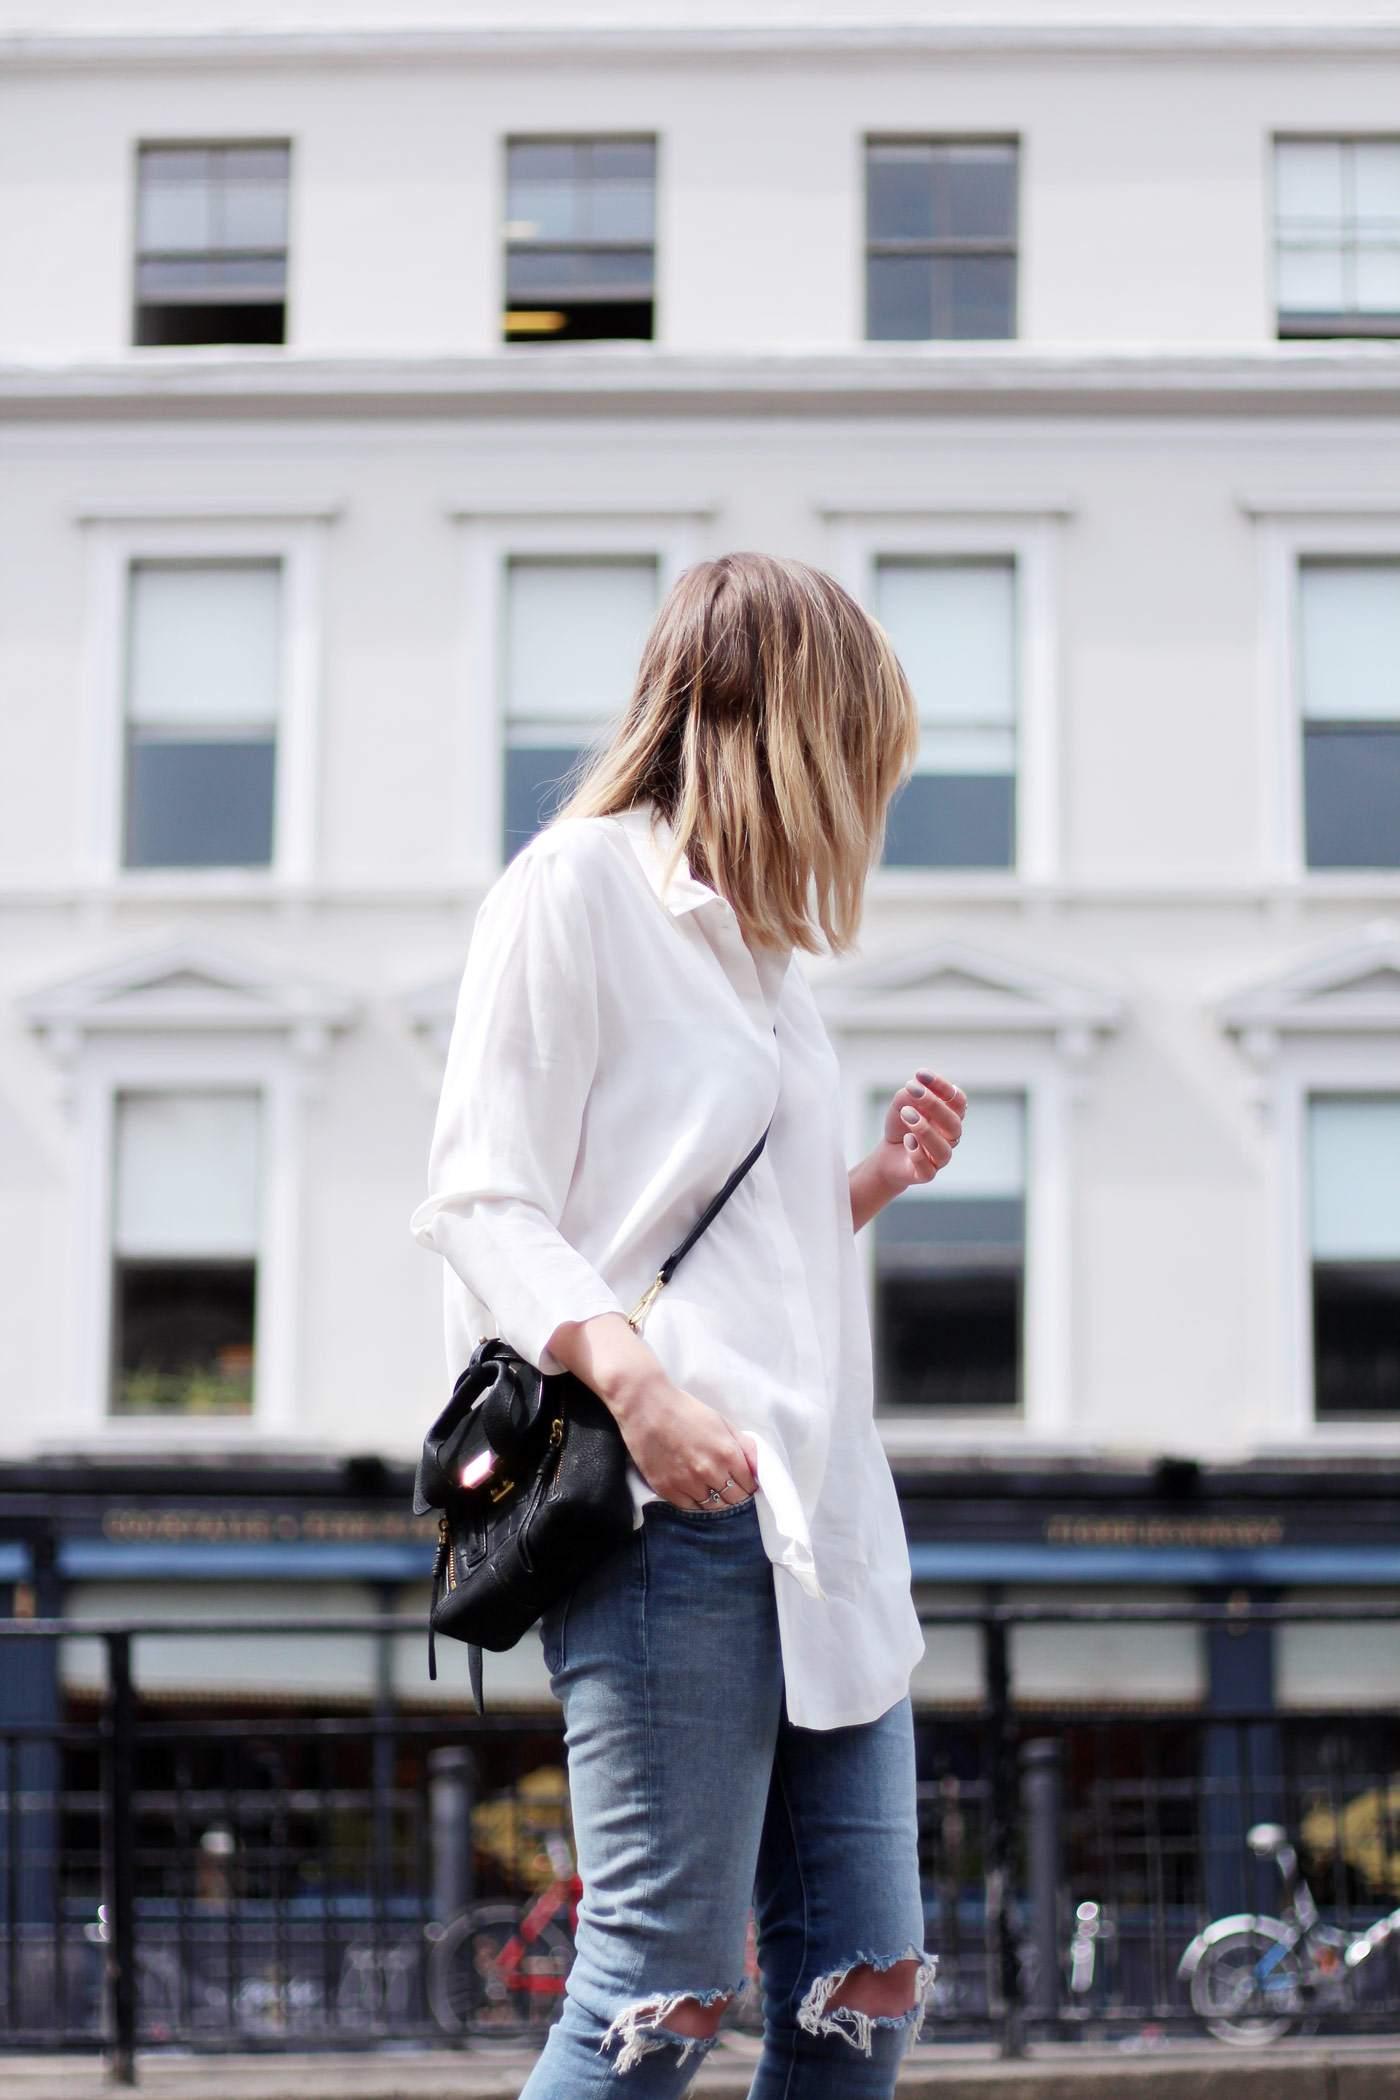 kurt-geiger-suede-peep-toe-boots-7FAM-jeans-COS-white-shirt-phillip-lim-pashli-mini-8